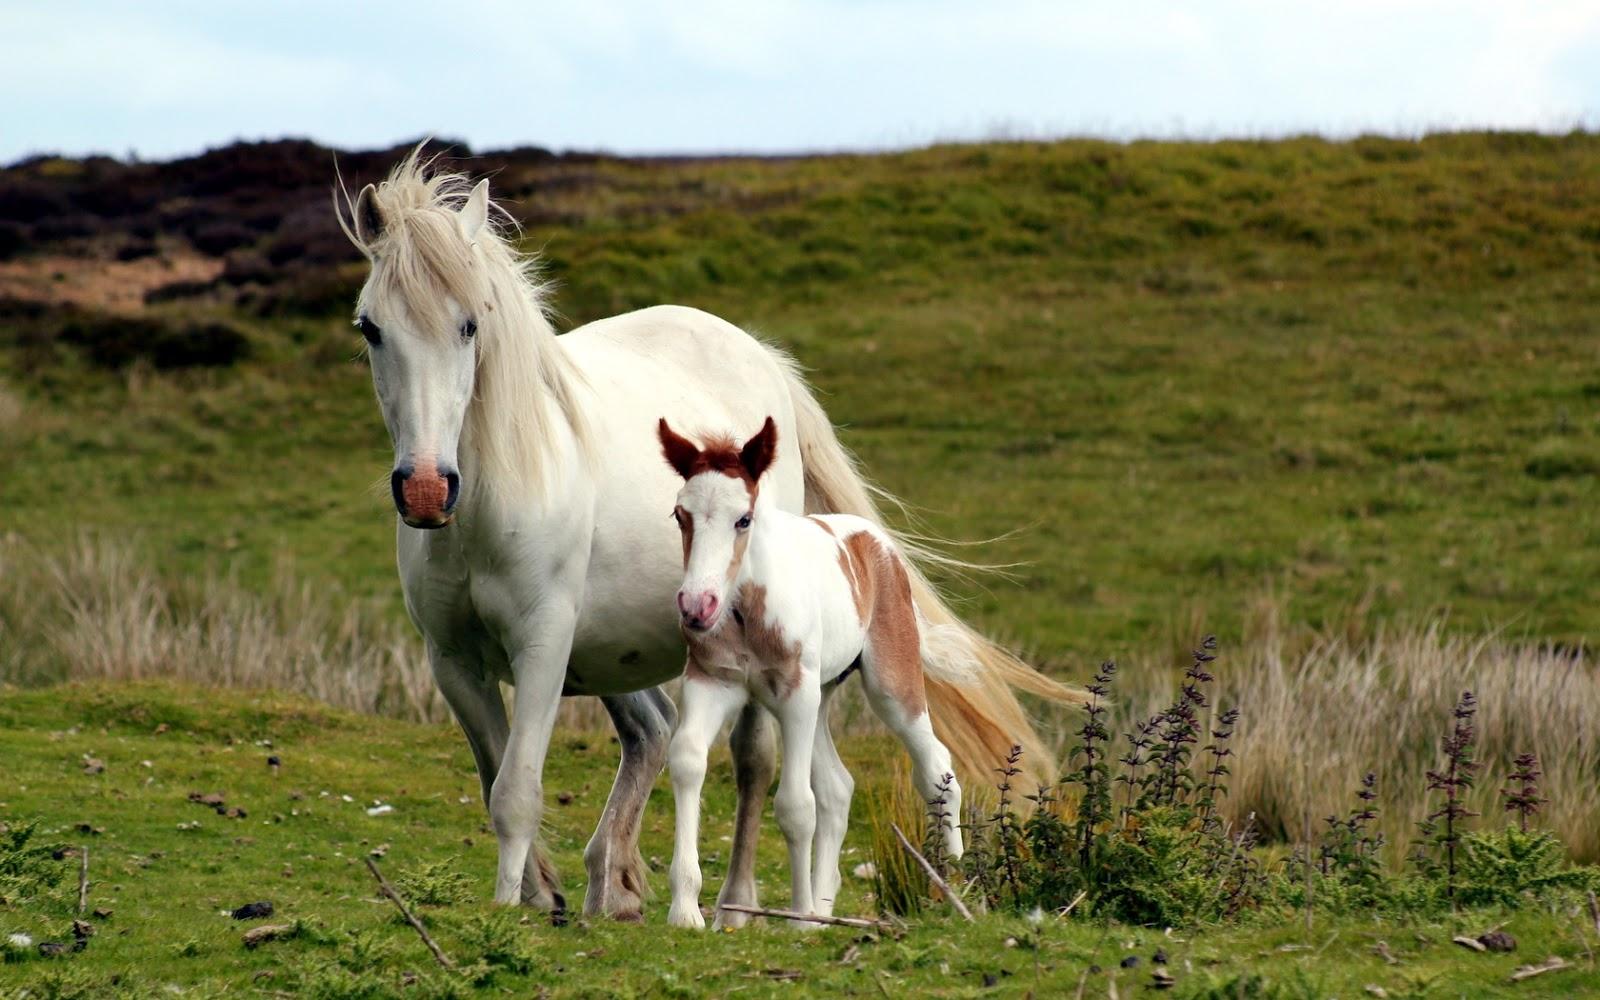 horse wallpaper,horse,mammal,vertebrate,pasture,mane